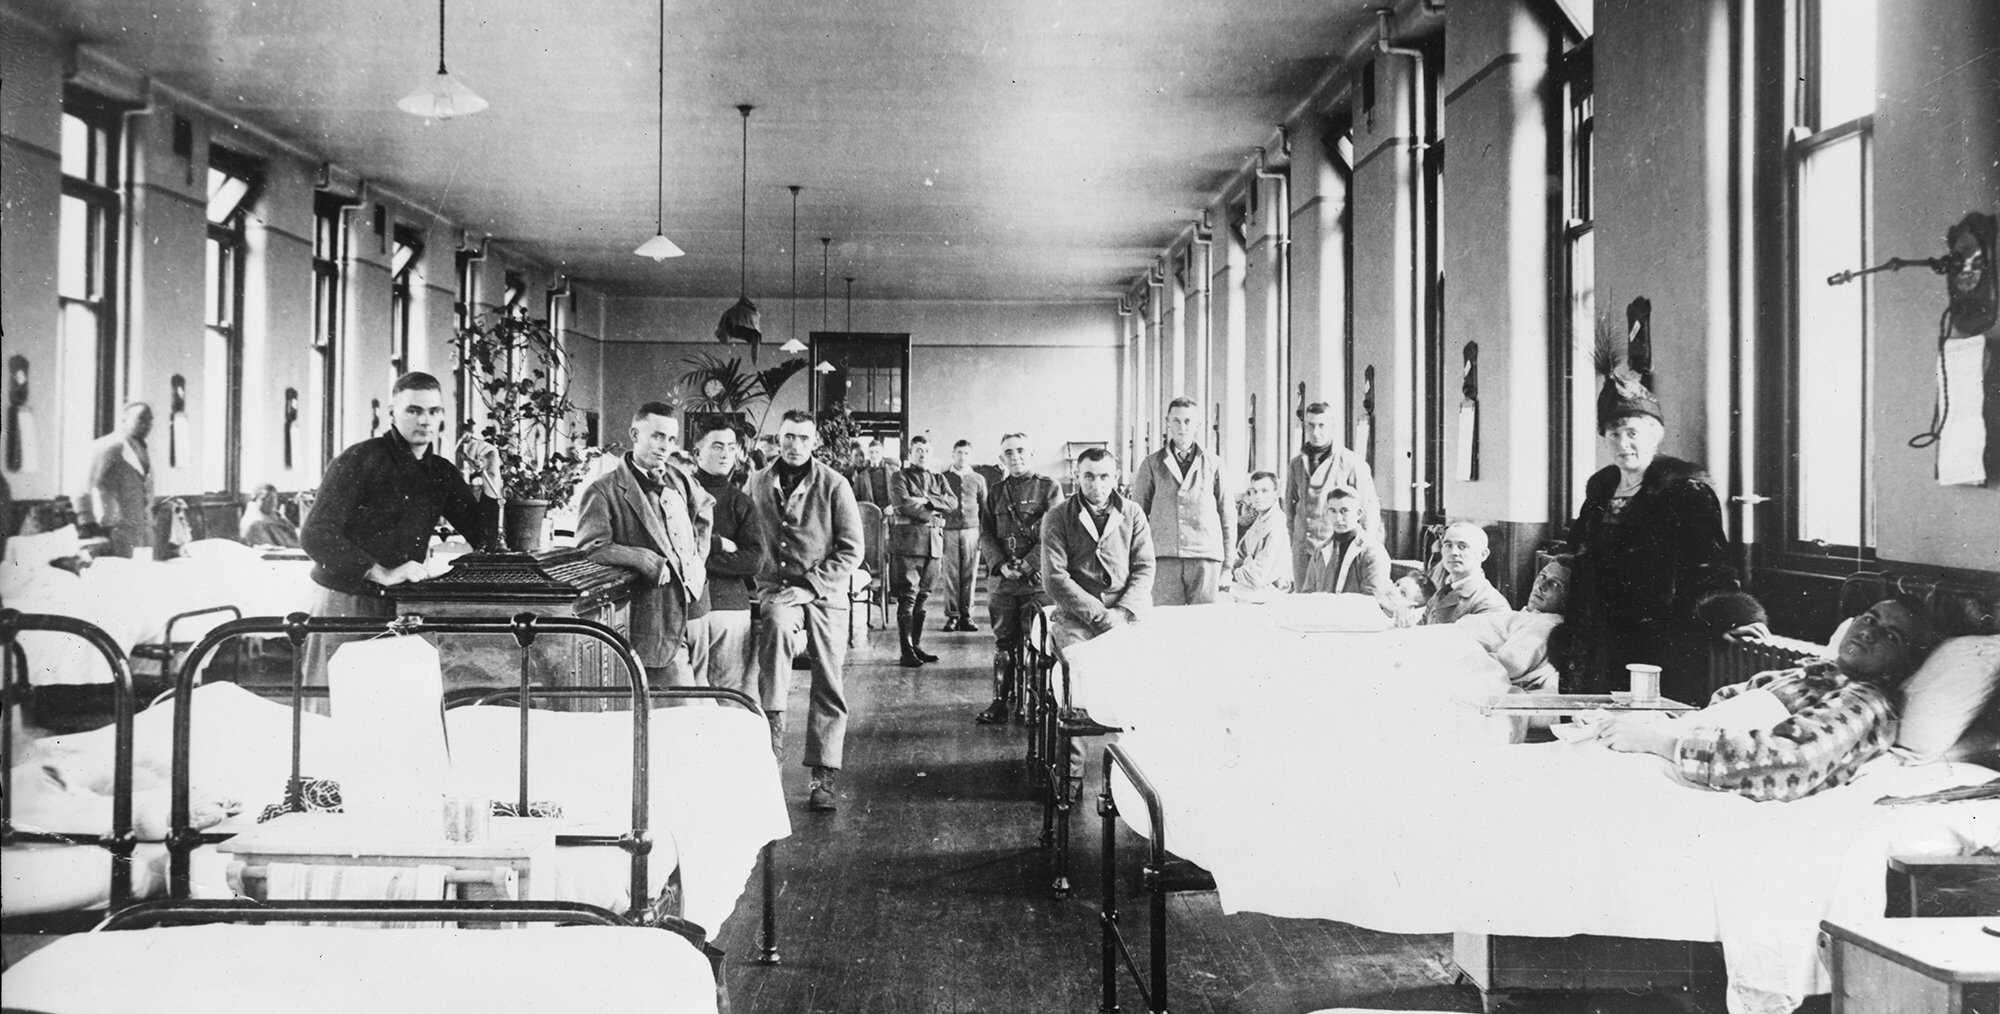 Influenza-First-Wave-1918-LOC-10096a.jpg